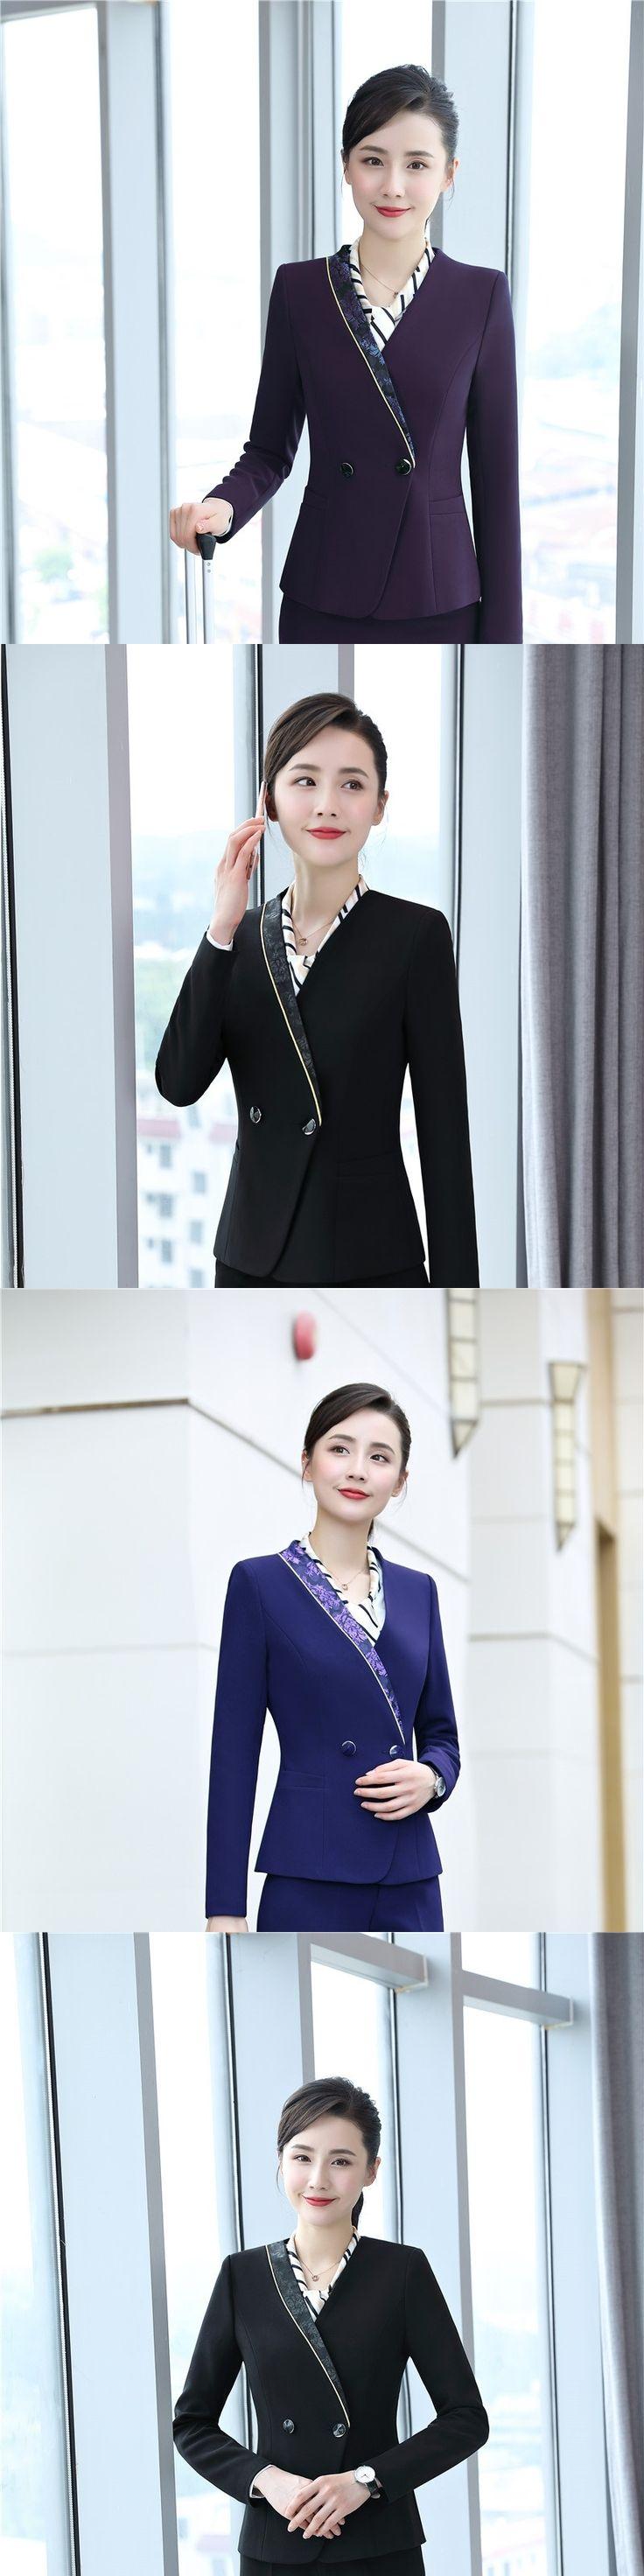 New Novelty Purple Formal Uniform Styles Autumn Winter Jackets Coat Ladies Office Work Outwear Female Tops Clothes Plus Size